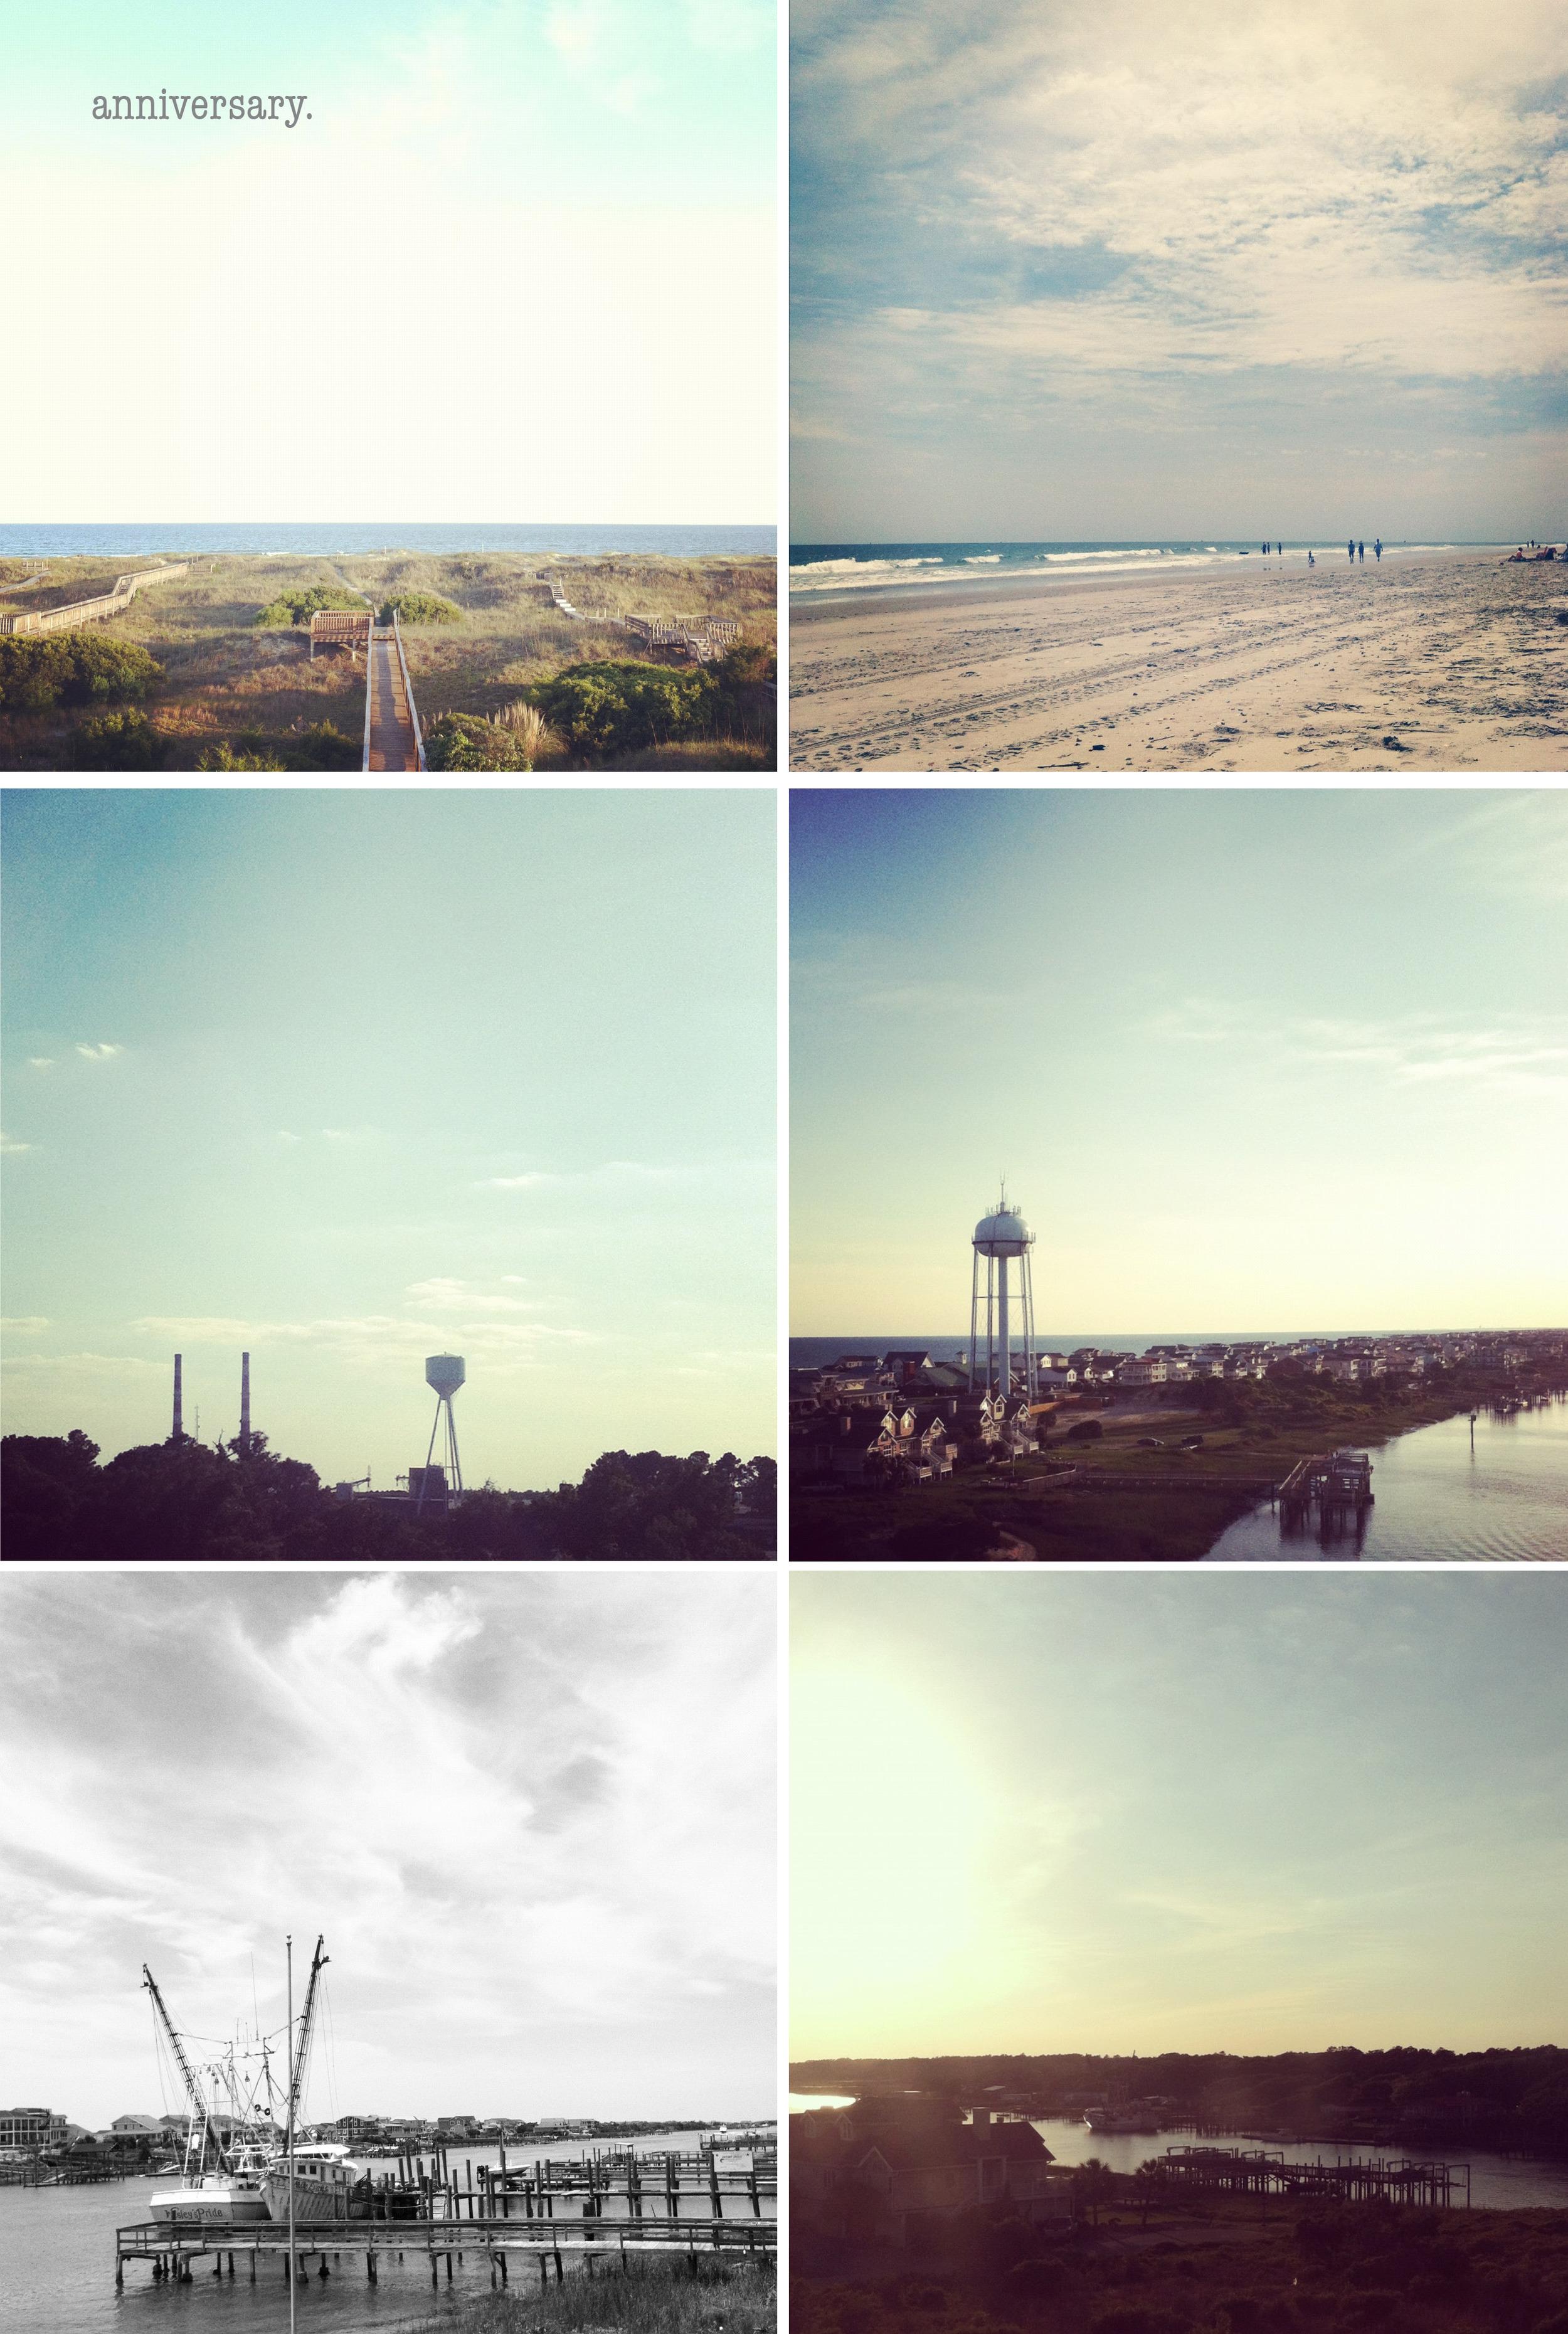 2012-05-12_instagram-holden beach2